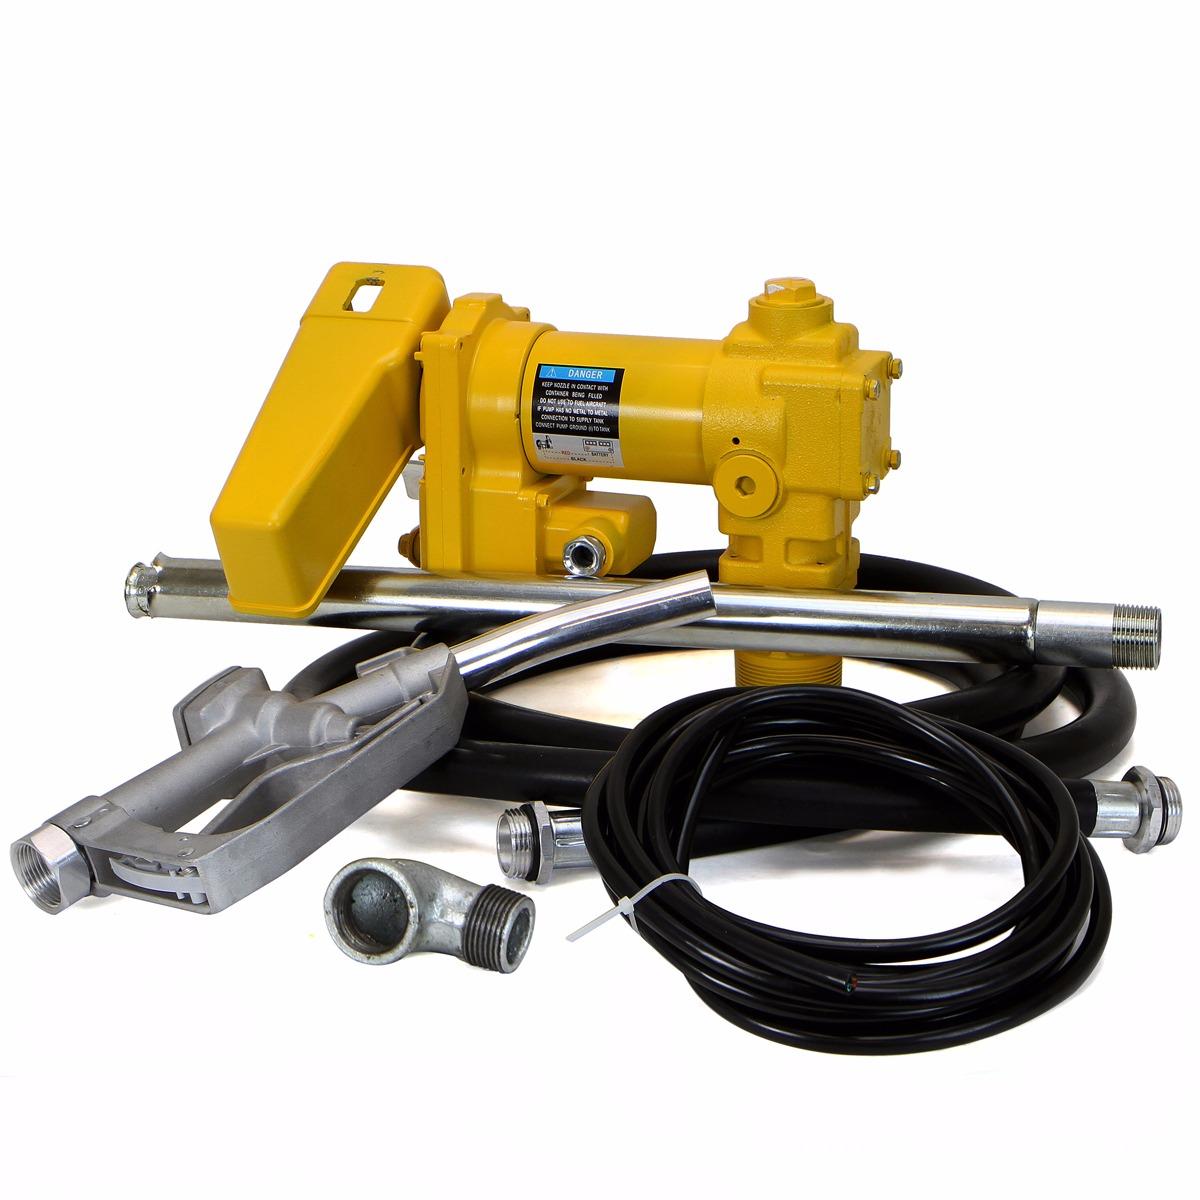 12V 1/4 HP 20GPM Diesel Gasoline Kerosene Fuel Transfer Pump Kit with Nozzle